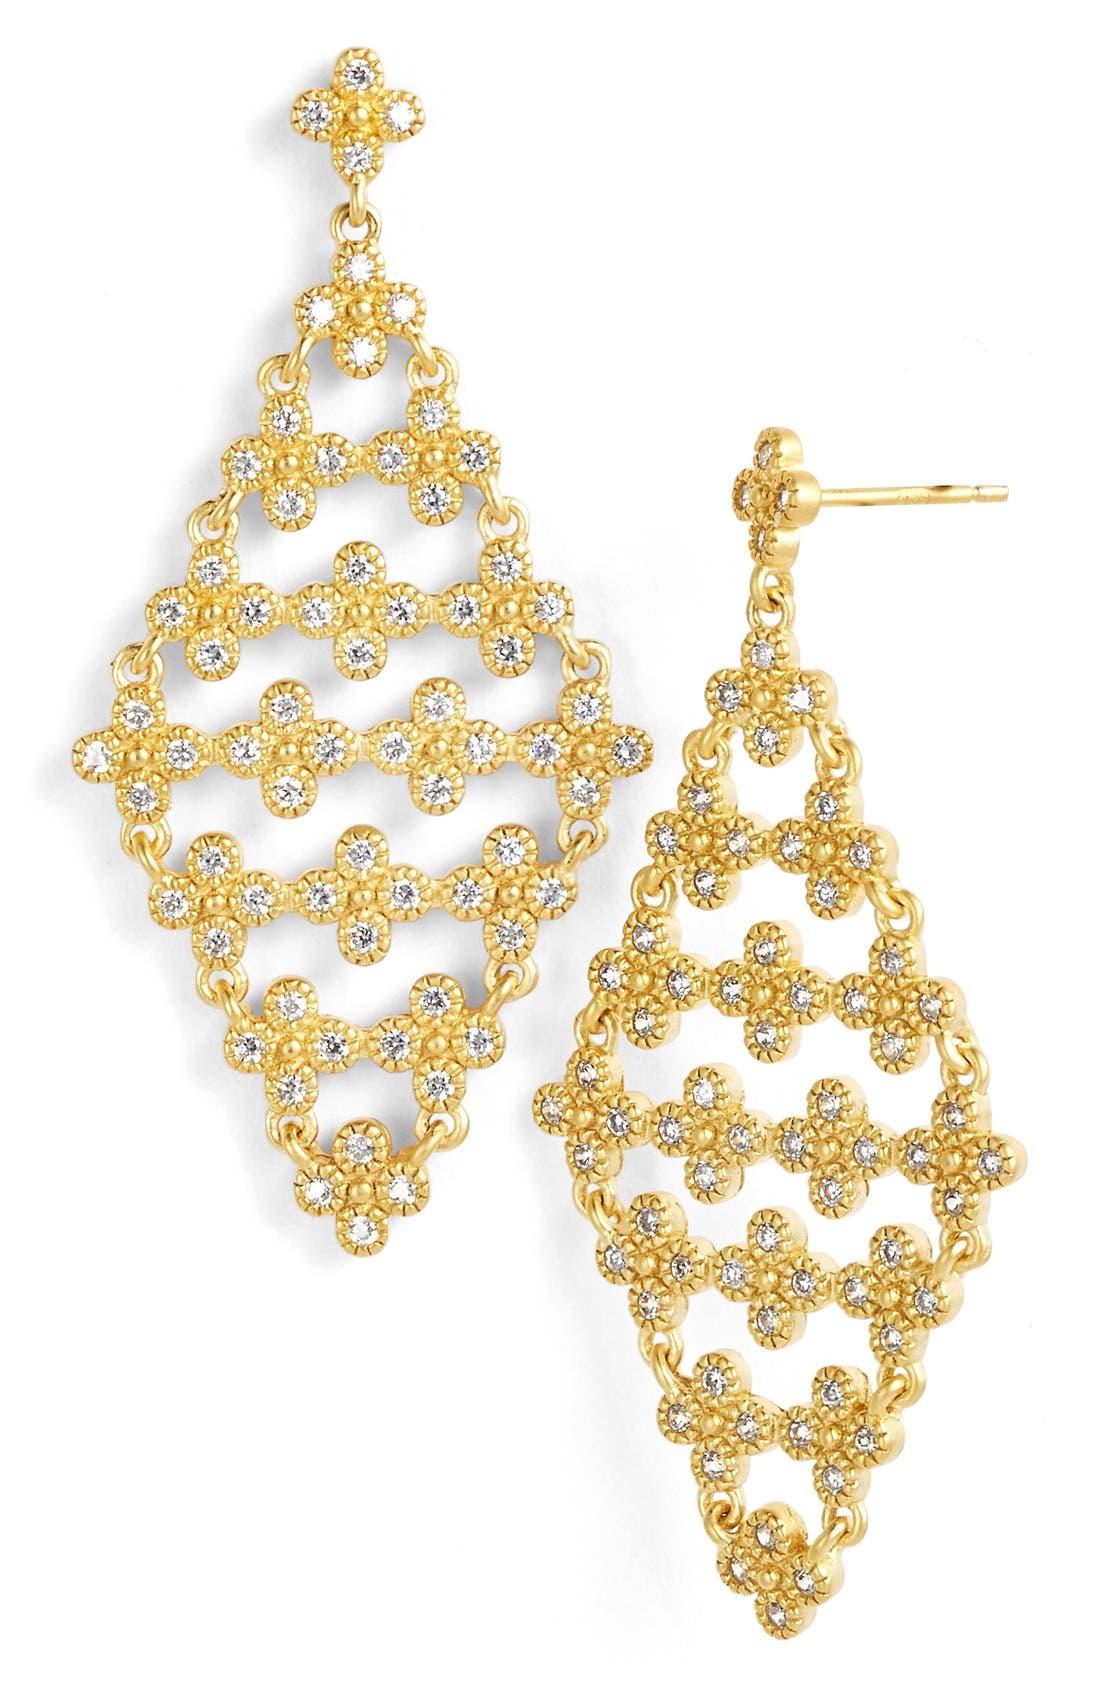 Alternate Image 1 Selected - FREIDA ROTHMAN 'Metropolitan' Floral Drop Earrings